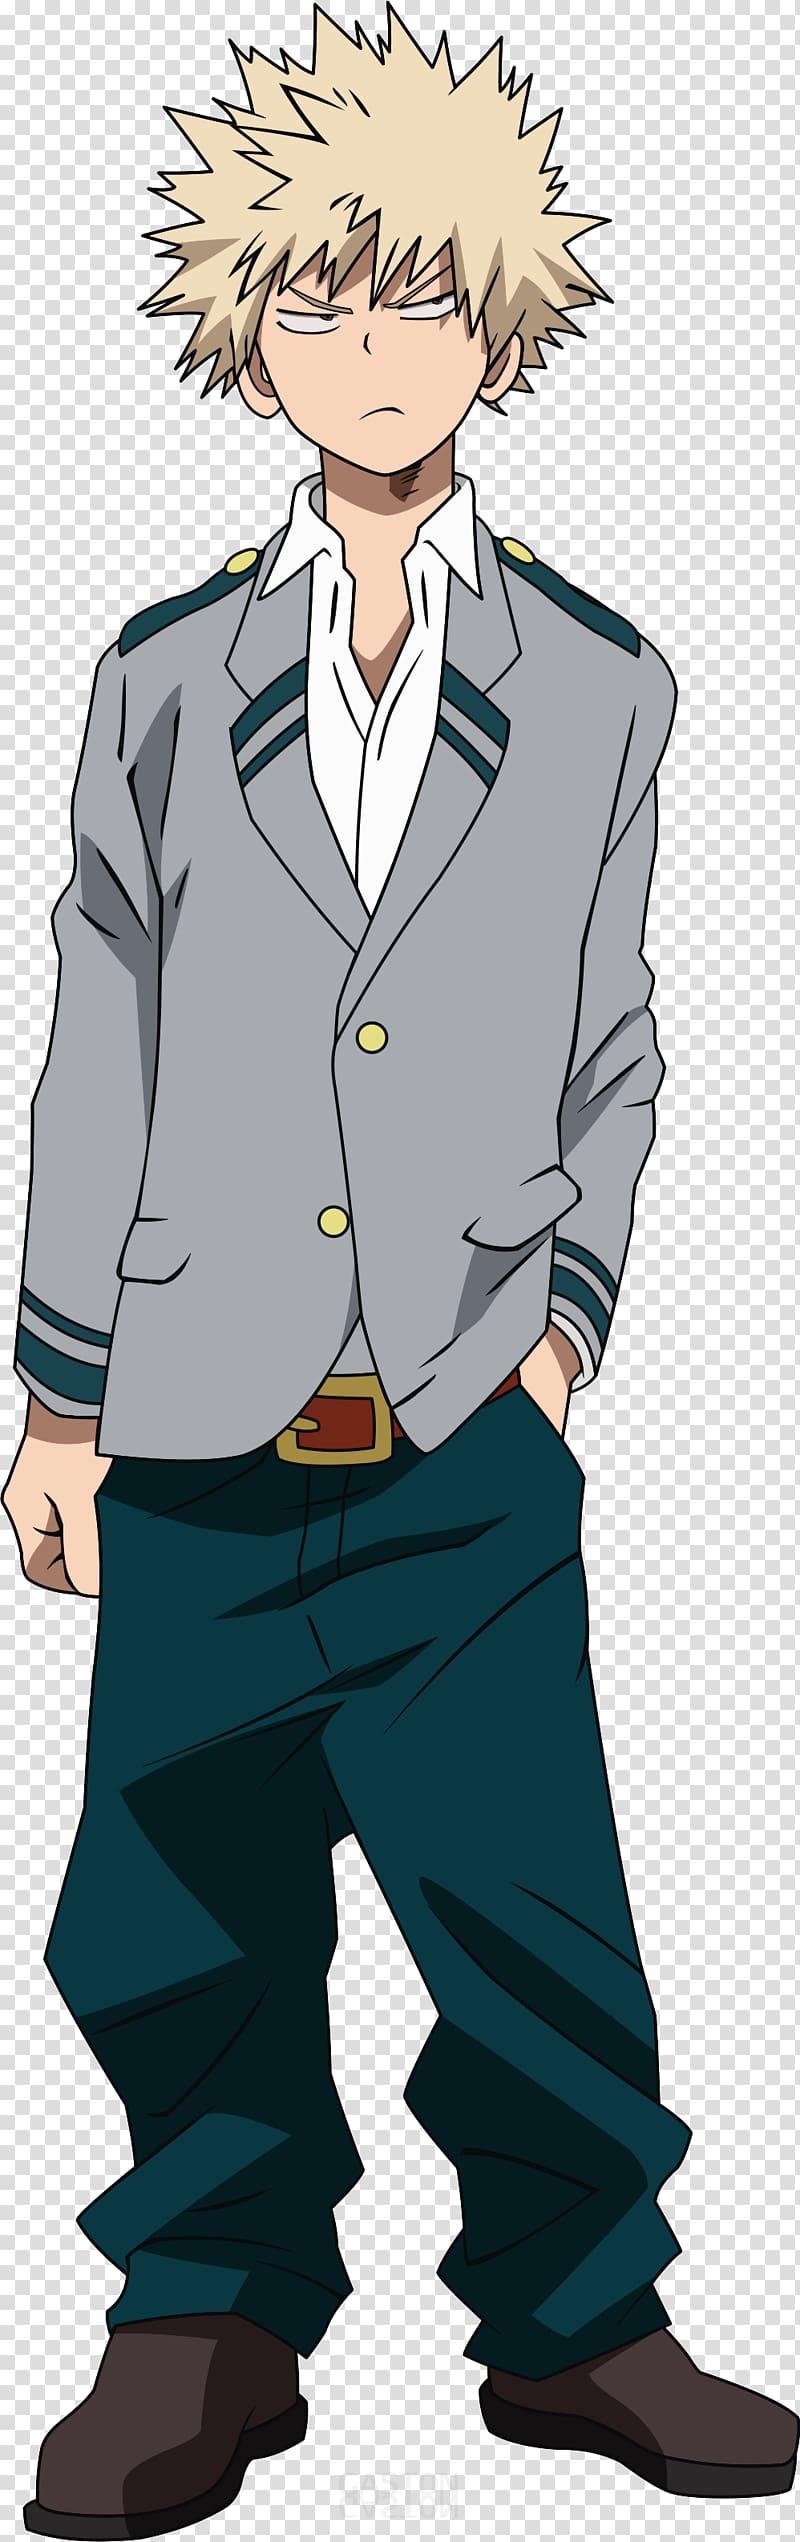 Katsuki Bakugou Transparent Background Png Cliparts Free Download Hiclipart Anime My Hero Boy Cartoon Characters